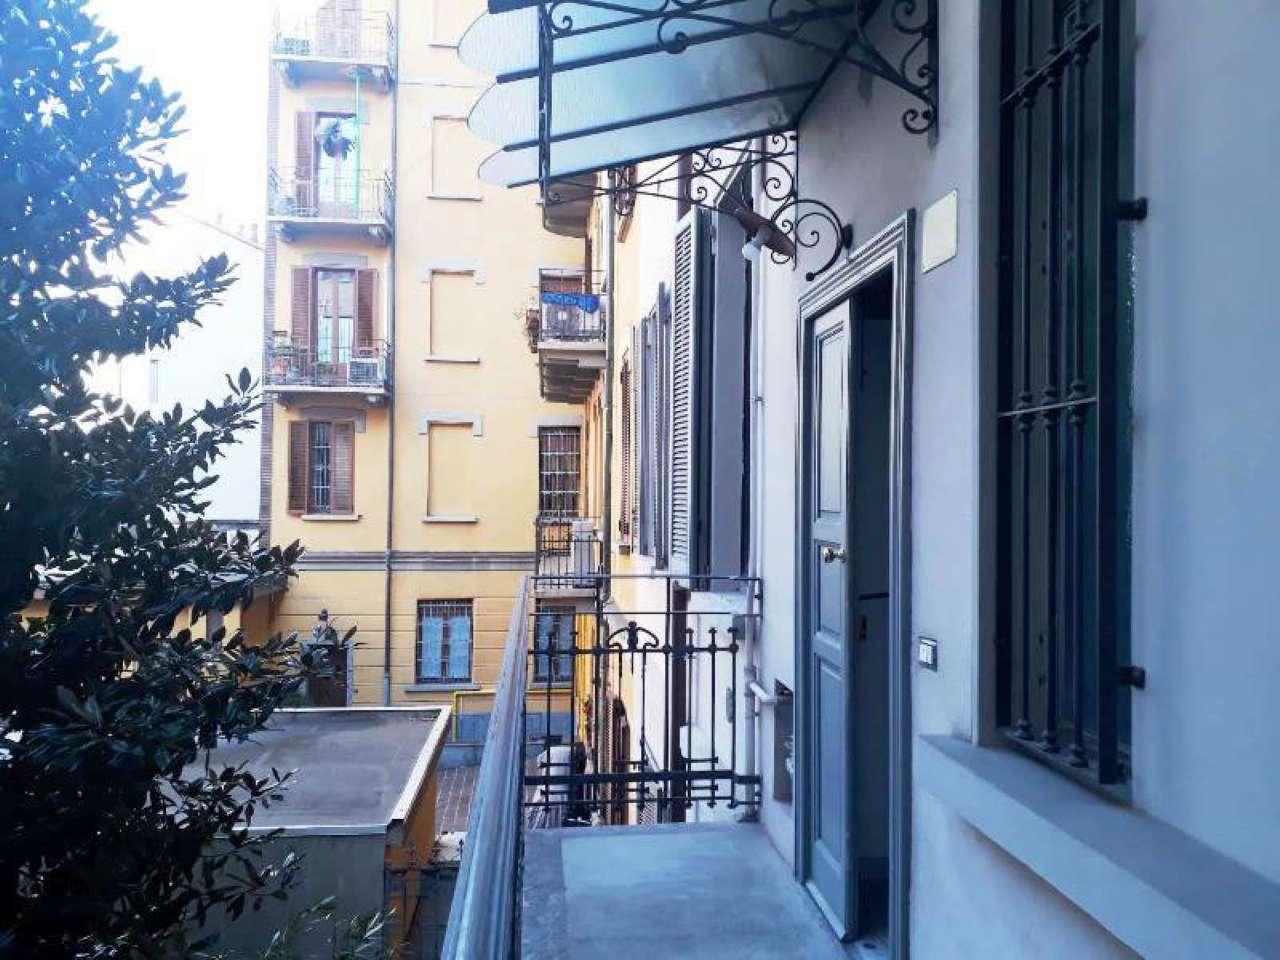 Appartamento in affitto Zona Buenos Aires, Indipendenza, C.so Ve... - via Bartolomeo Eustachi 29 Milano